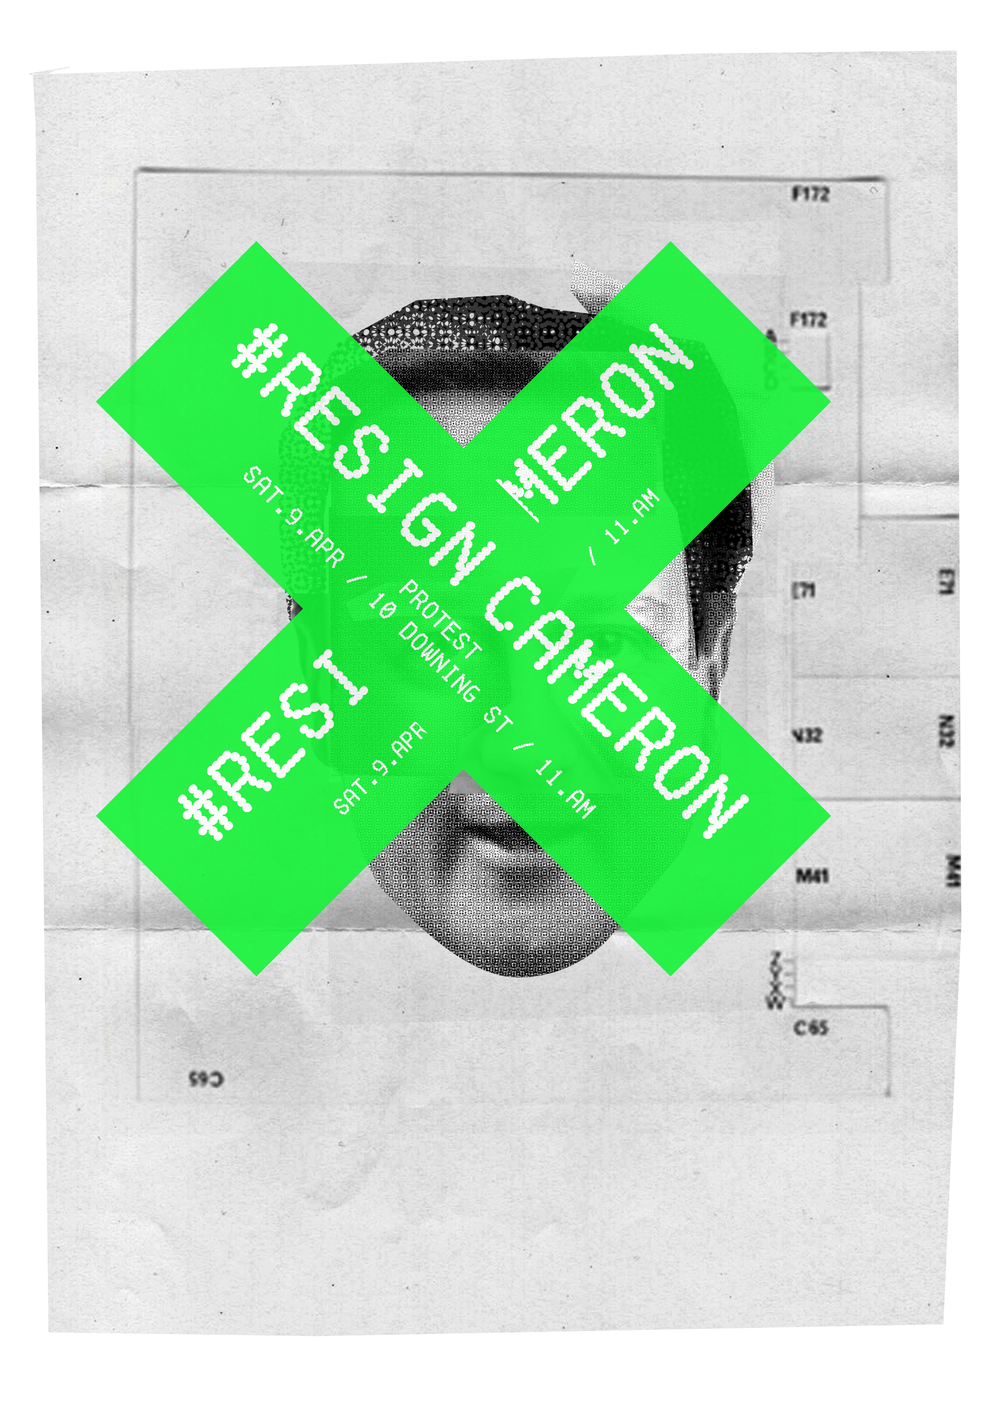 RESIGNCAMERON-green3.jpg